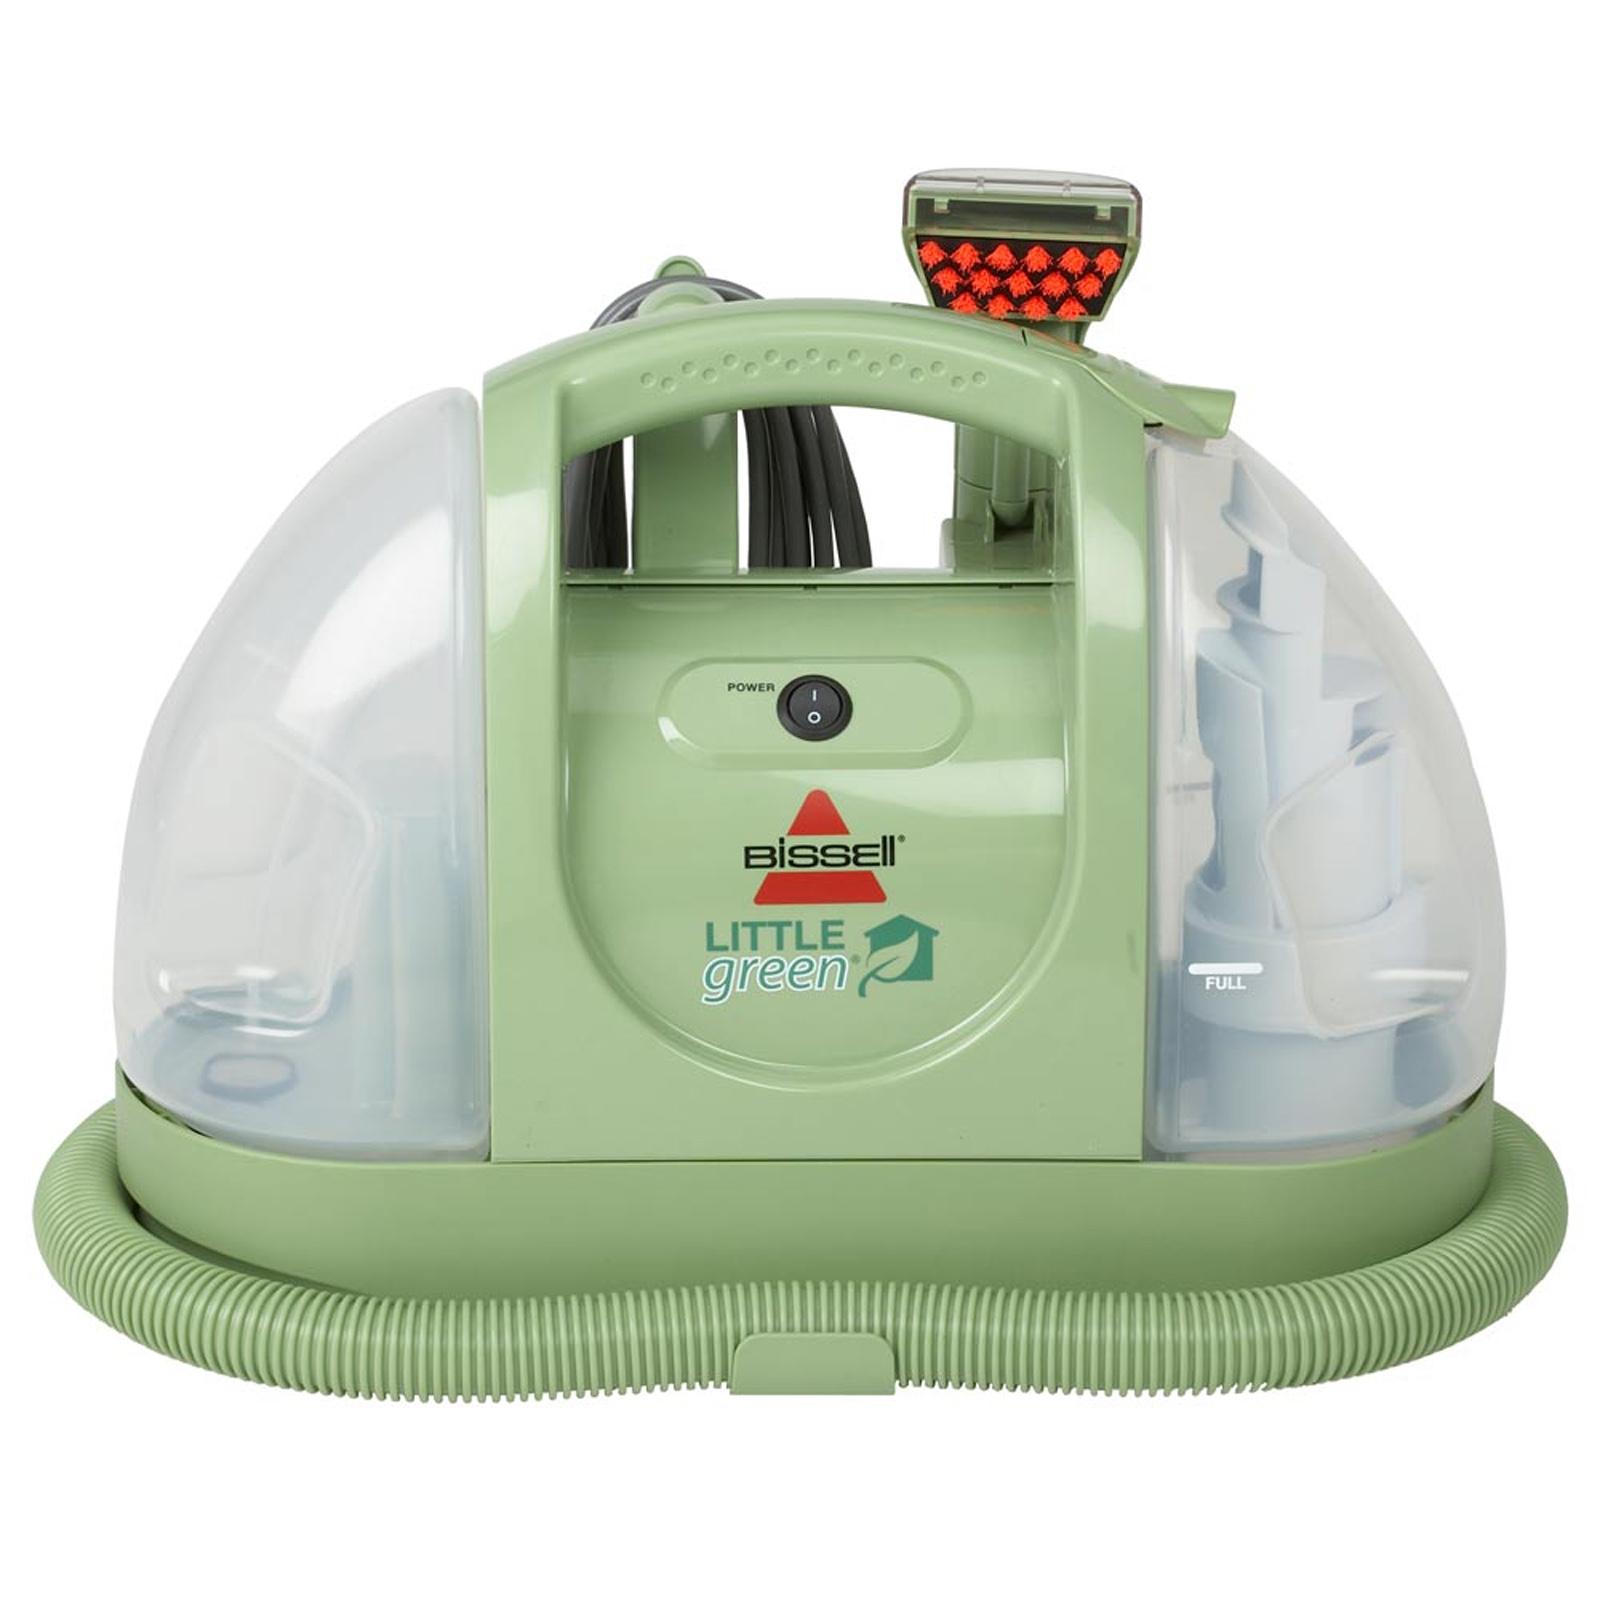 Bissell Little Green Spot Cleaner 14007